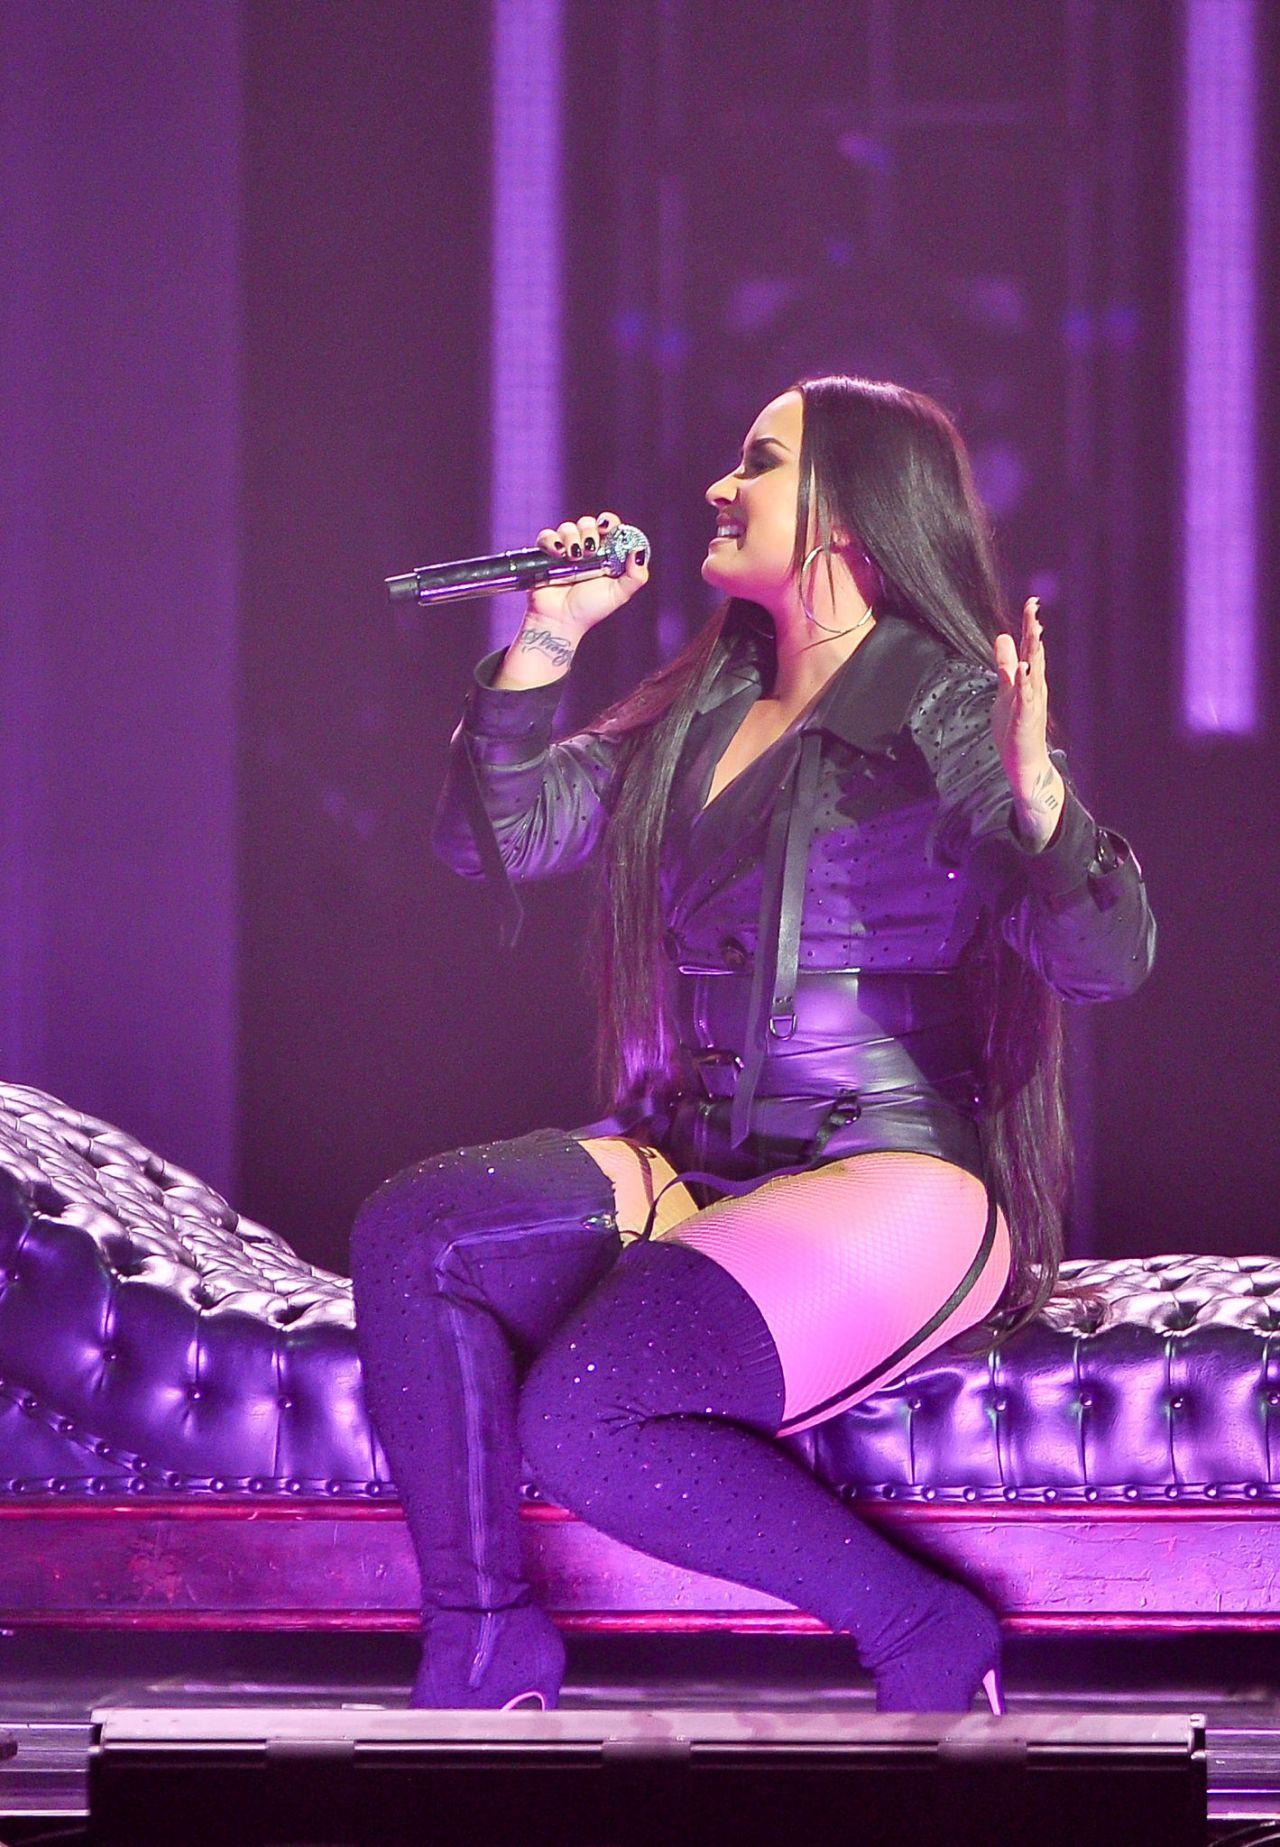 Demi Lovato Quot Tell Me You Love Me Quot Tour In San Jose 02 28